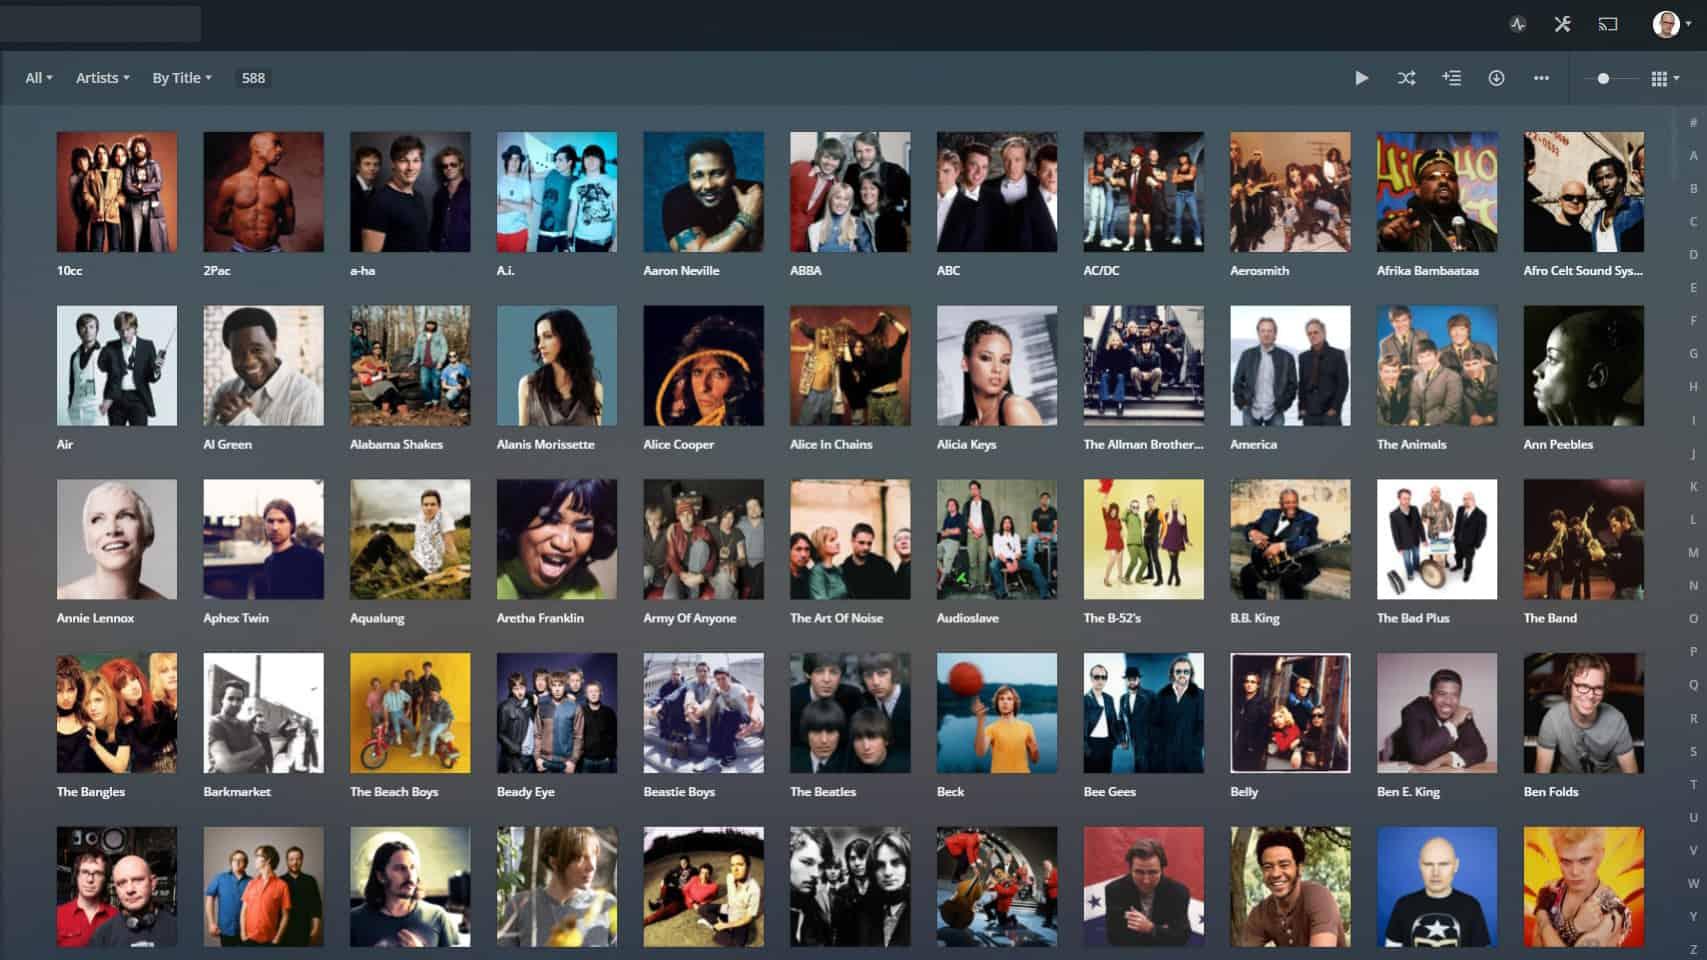 A screenshot of what the Plex music interface looks like on desktop.